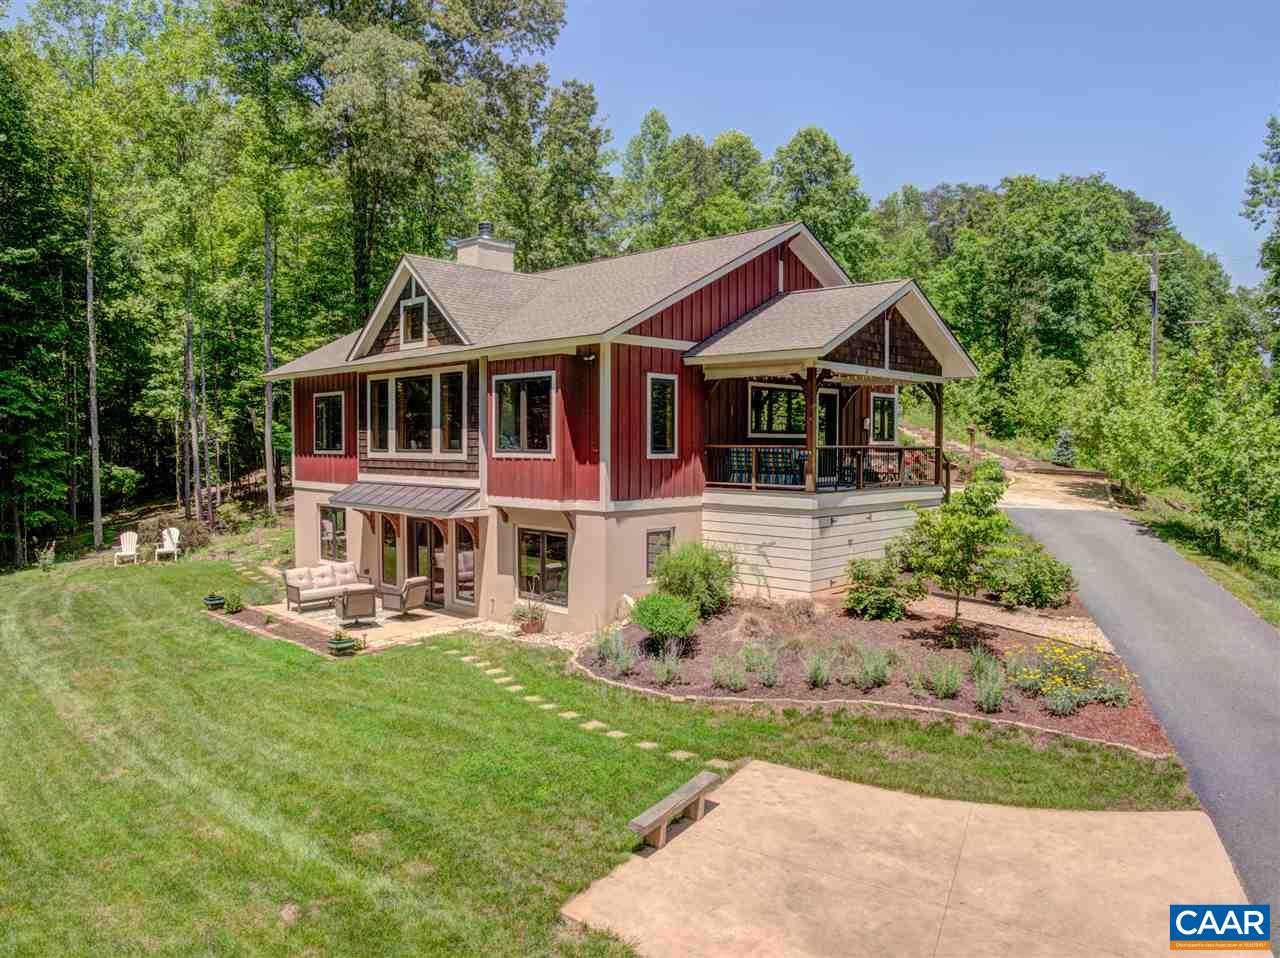 home for sale , MLS #577136, 100 Miller School Rd